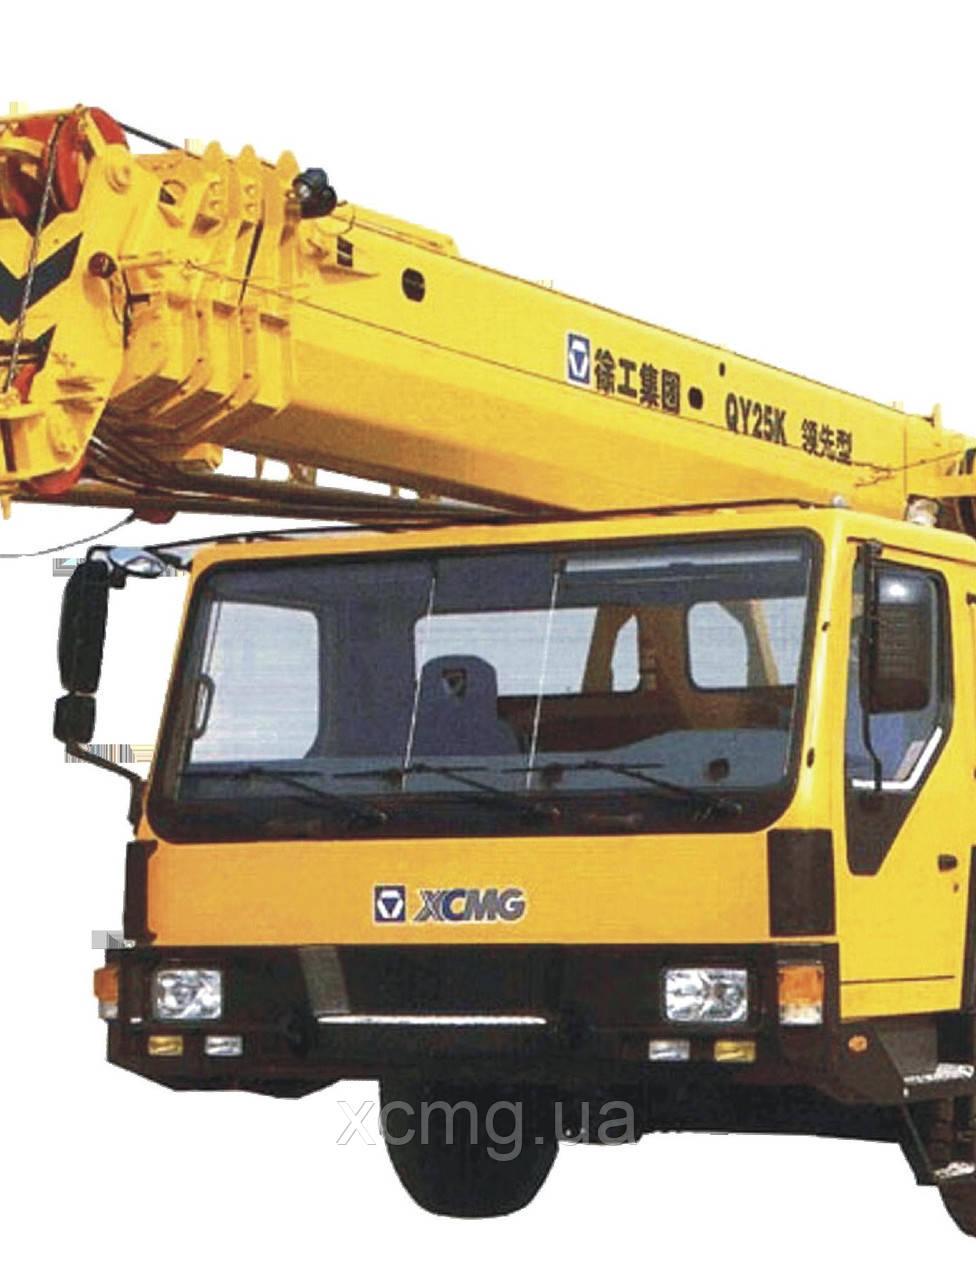 Лобове скло кабіни для водія автокрана QY25k5